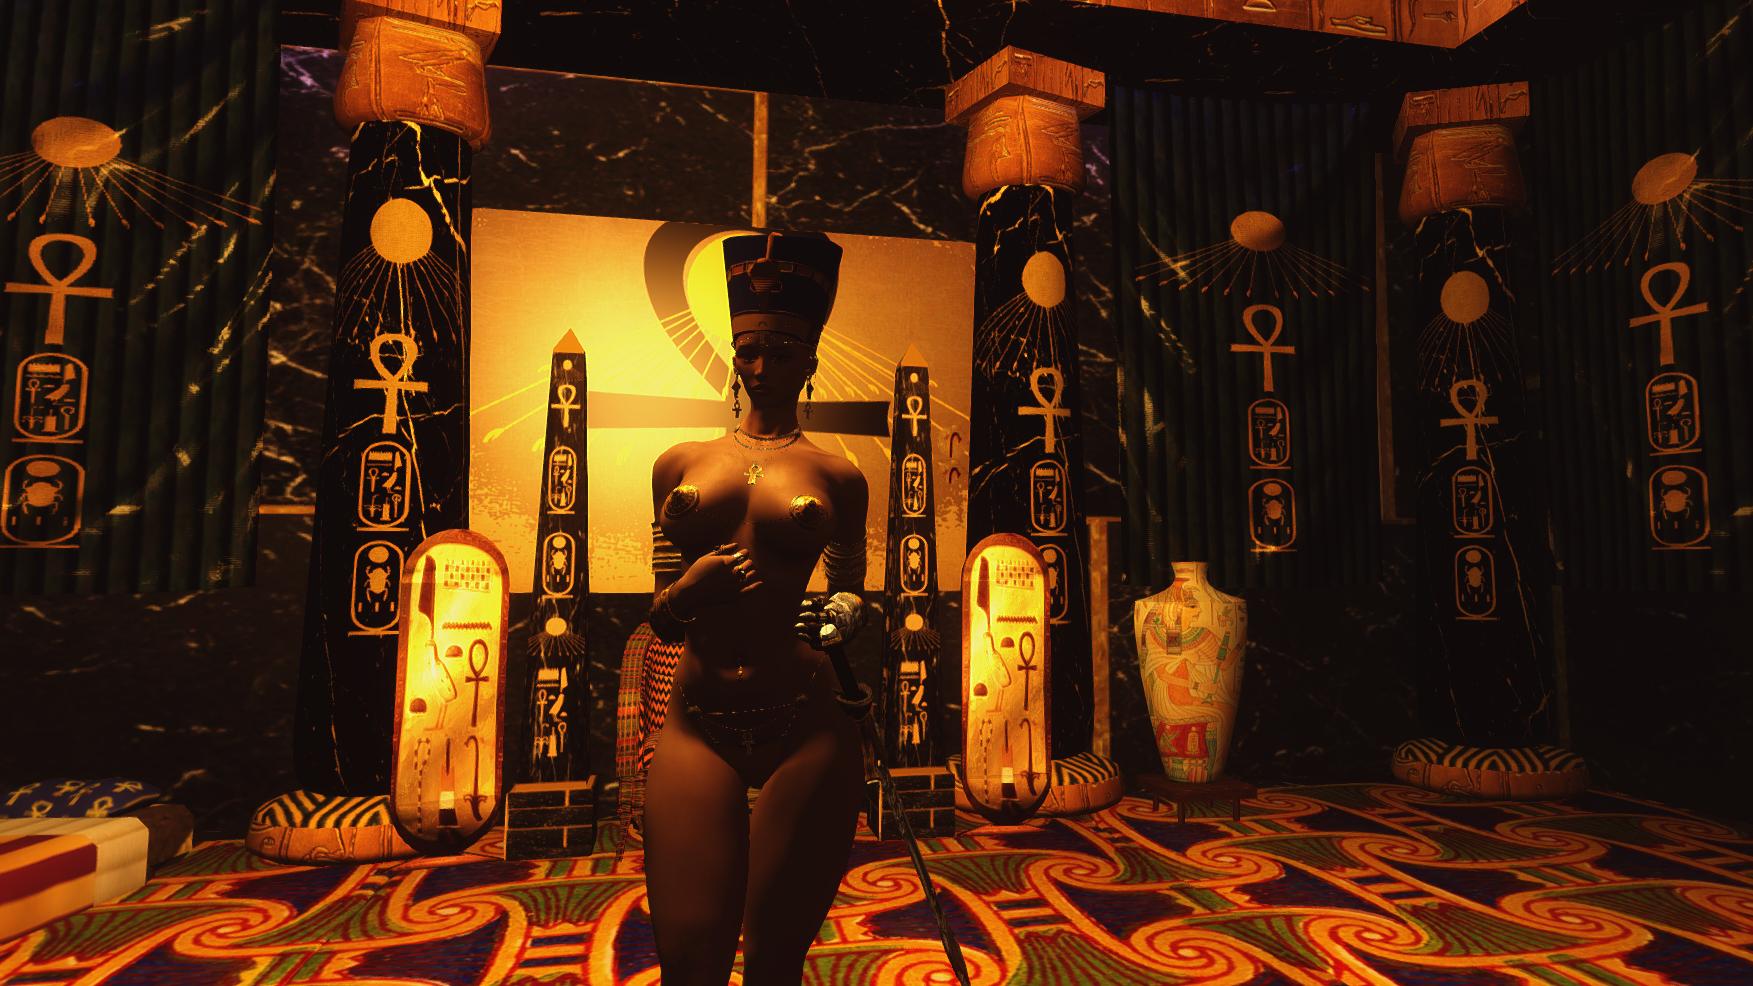 Desktop Screenshot 2019.11.10 - 16.08.50.27.png - The Elder Scrolls 5: Skyrim